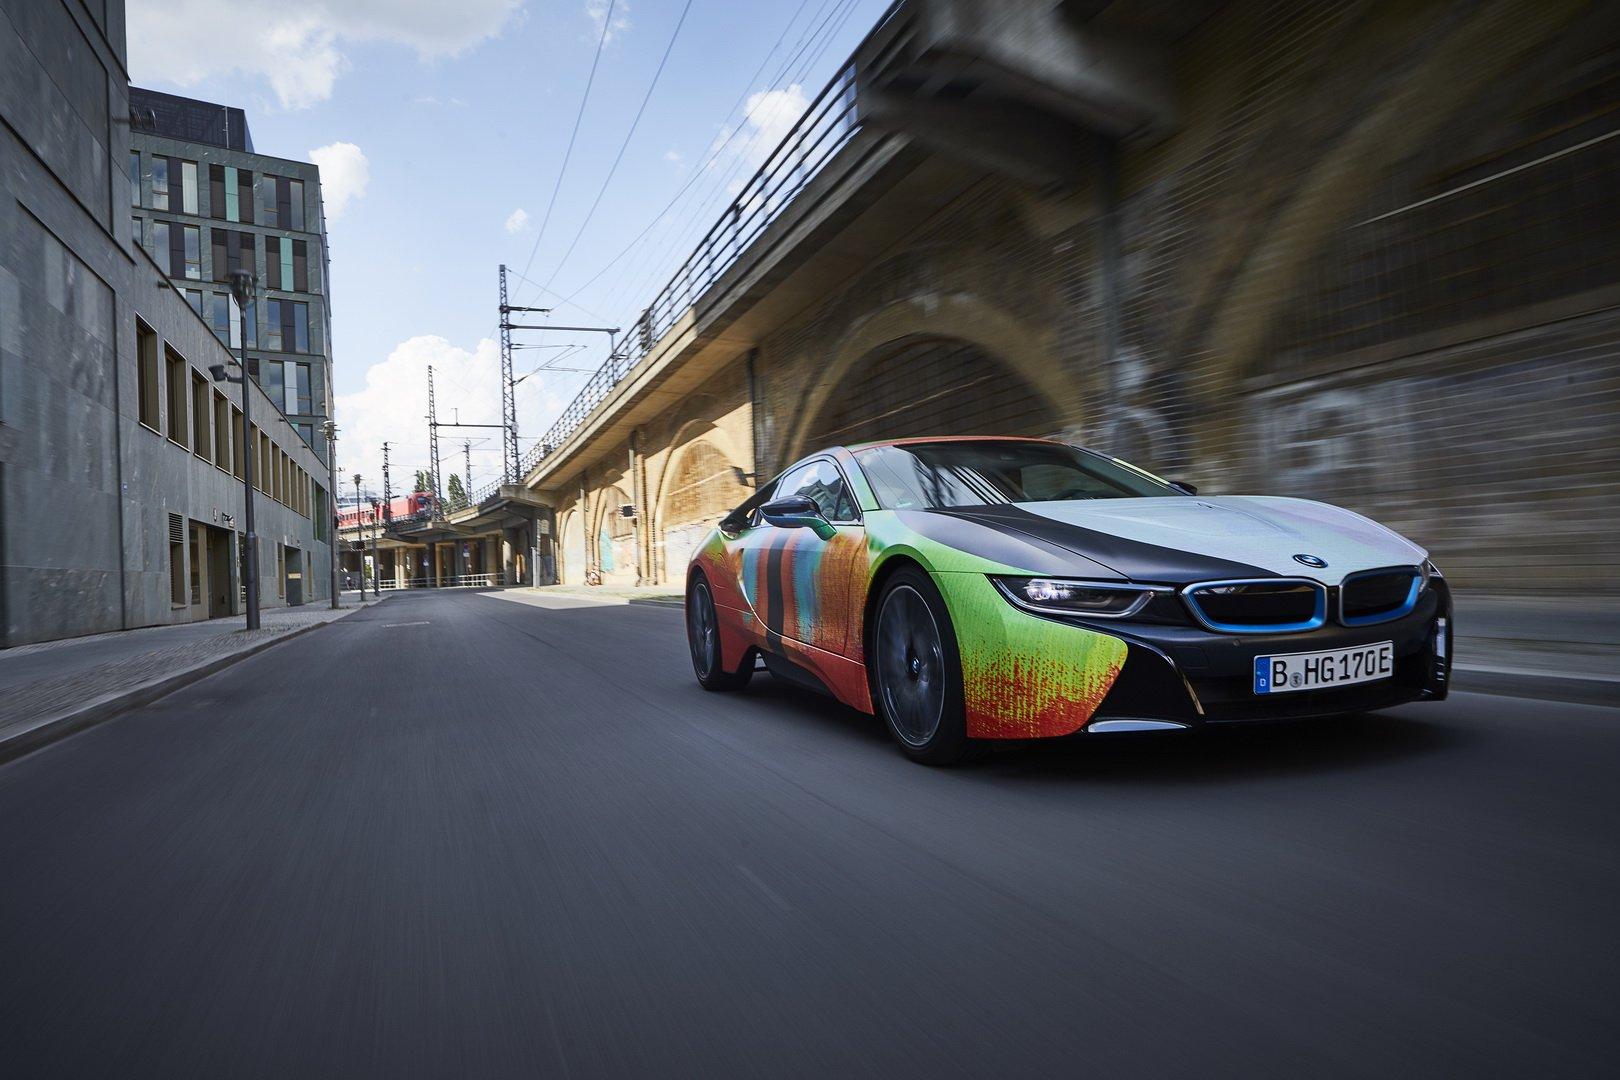 BMW-i8-car-art-3